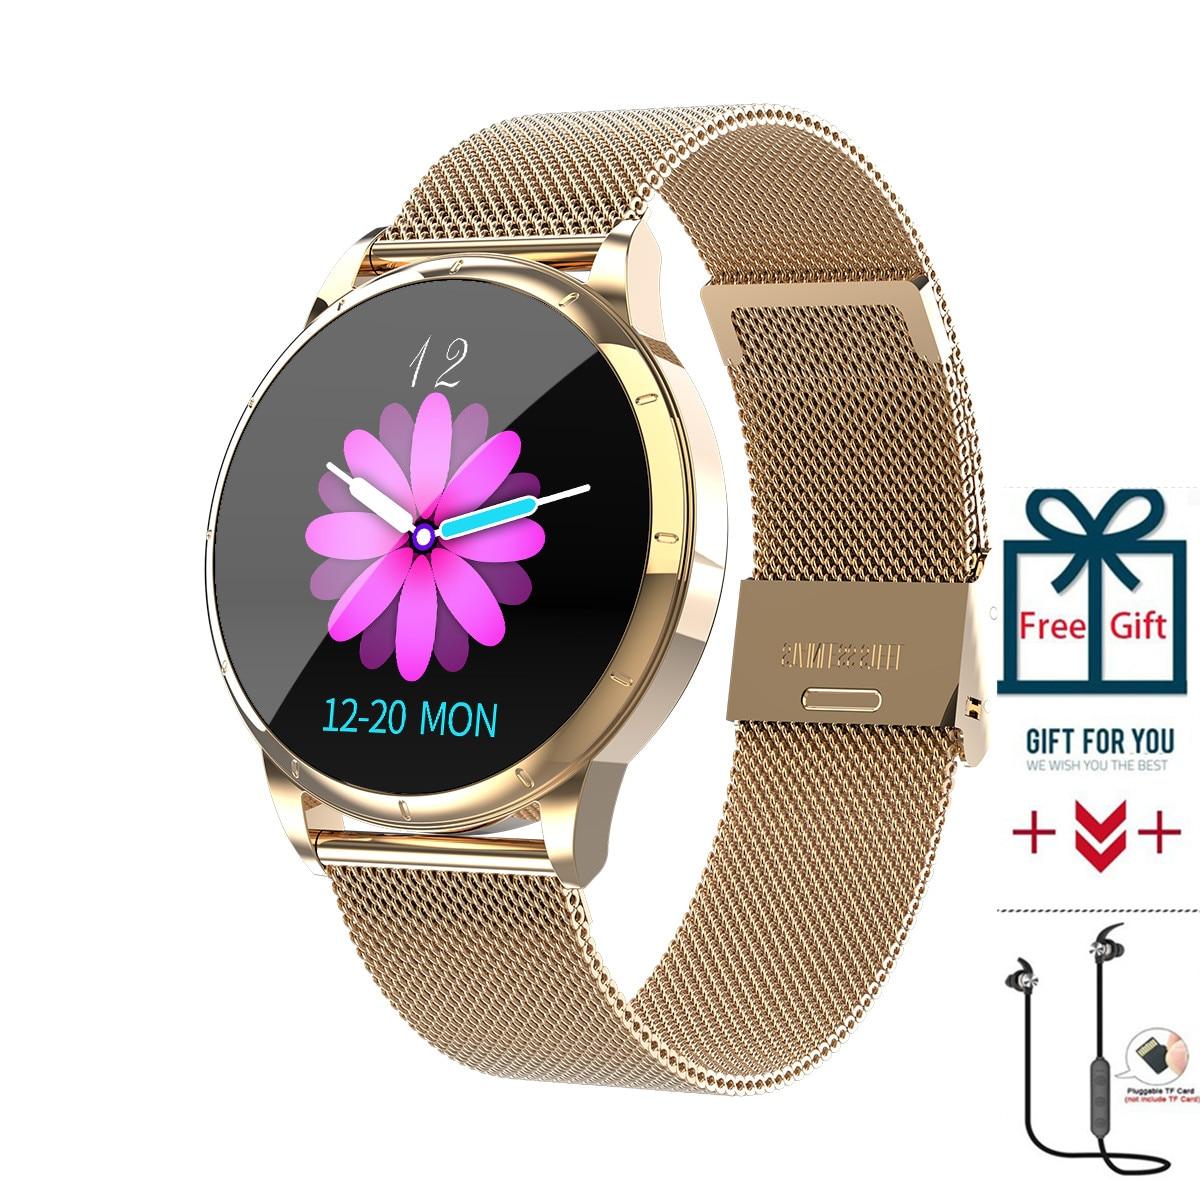 Smart IP67 Tempered Glass Watch Smart Bracelet Activity Tracker Fitness Heart Rate Monitor Sports Men WrisBand Women SmartWatch